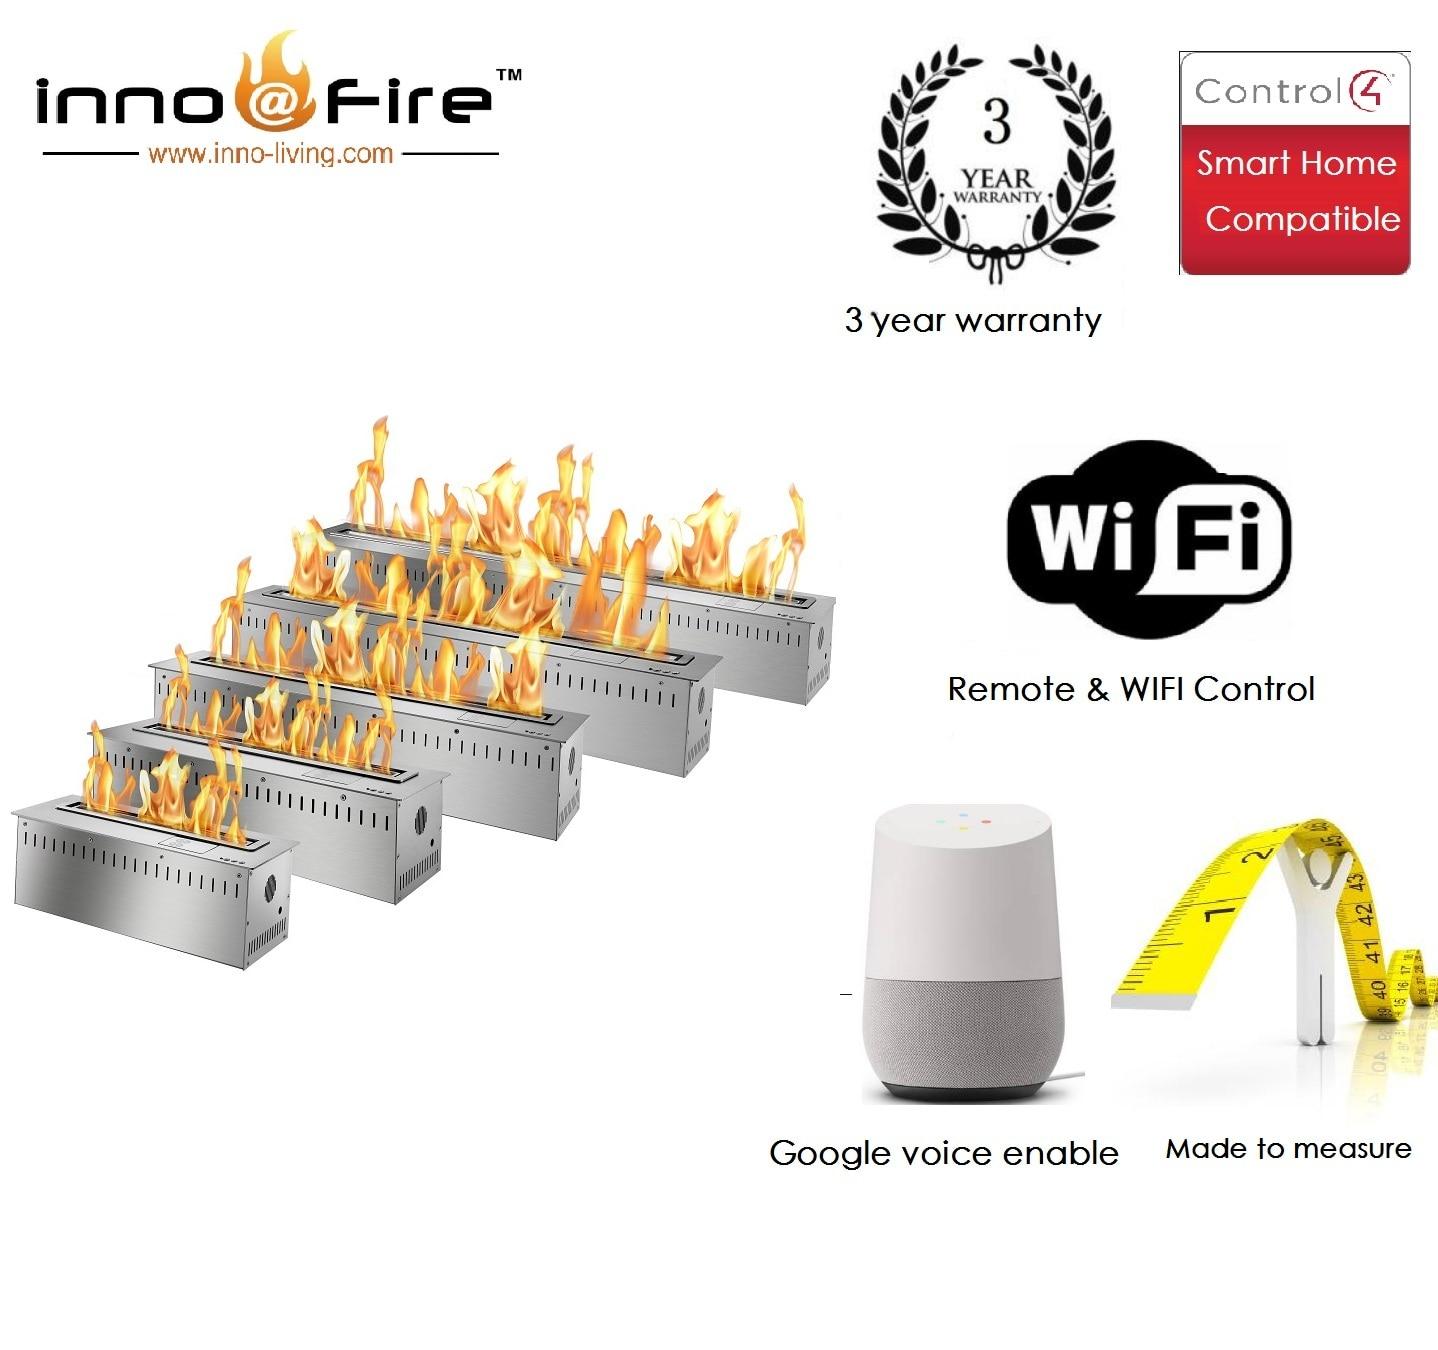 Inno Living 24 Inch Intelligent Fireplace Wifi Control Bio Ethanol Fuel